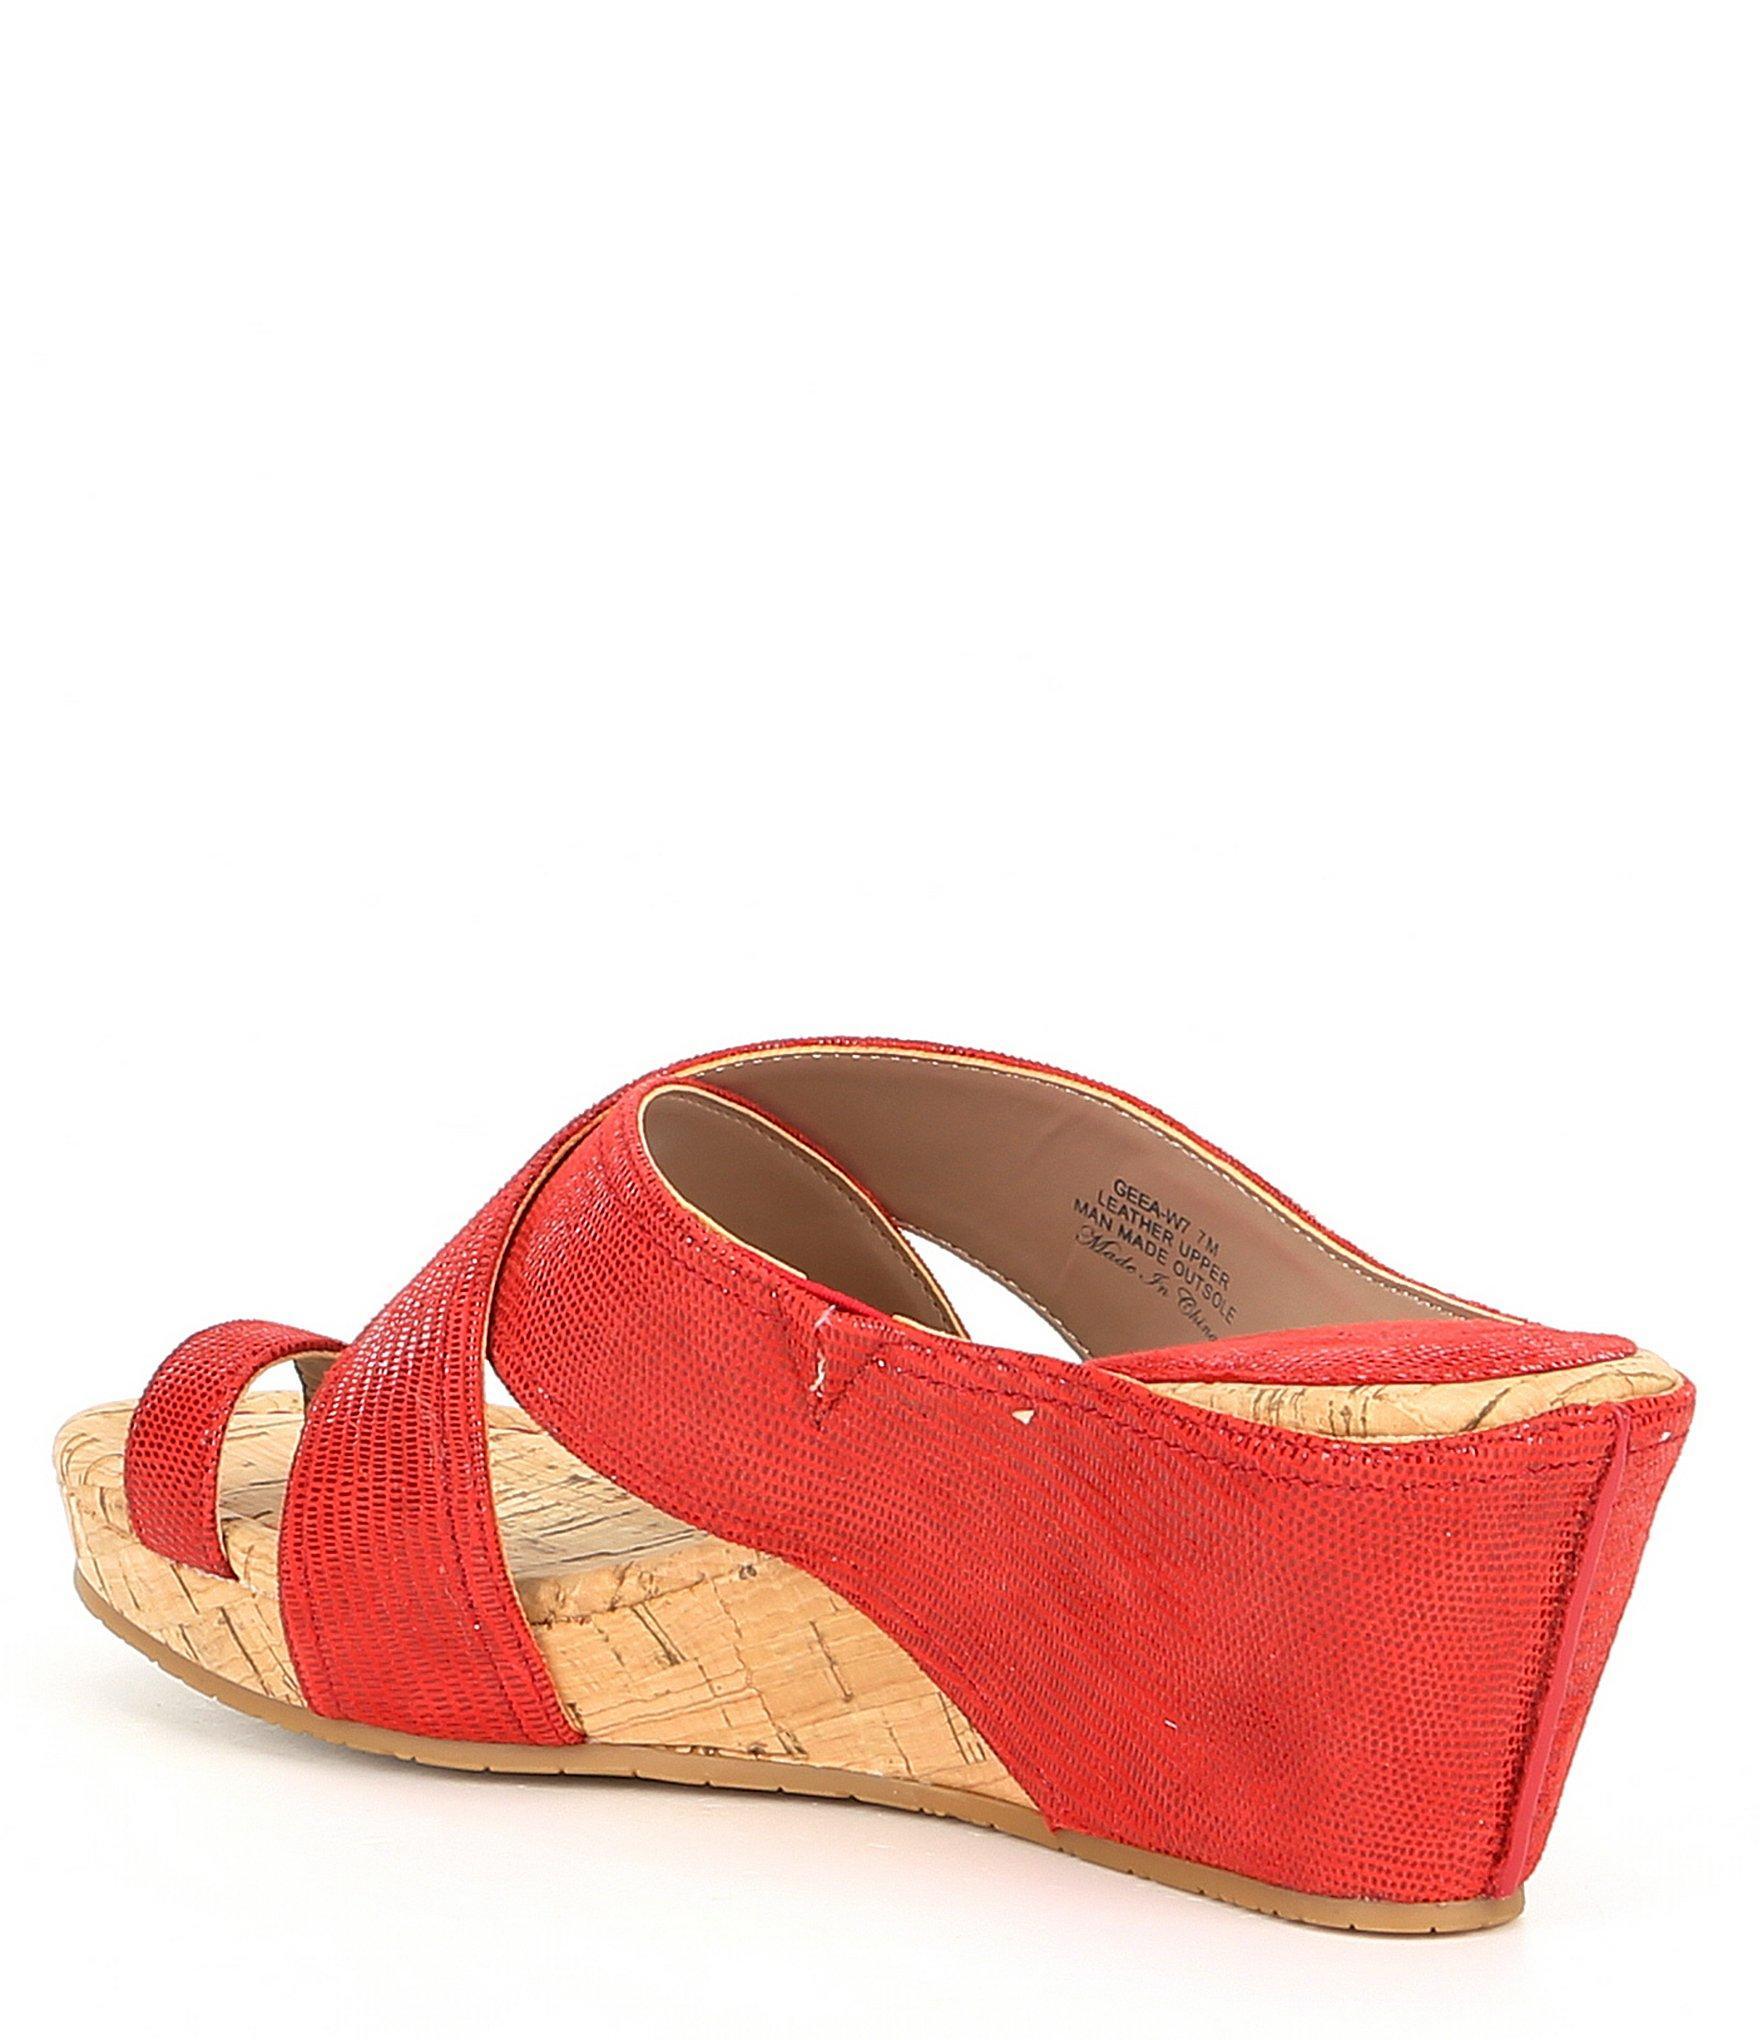 8049f4e4ad3 Lyst - Donald J Pliner Geea Lizard Print Leather Toe Thong Cork ...